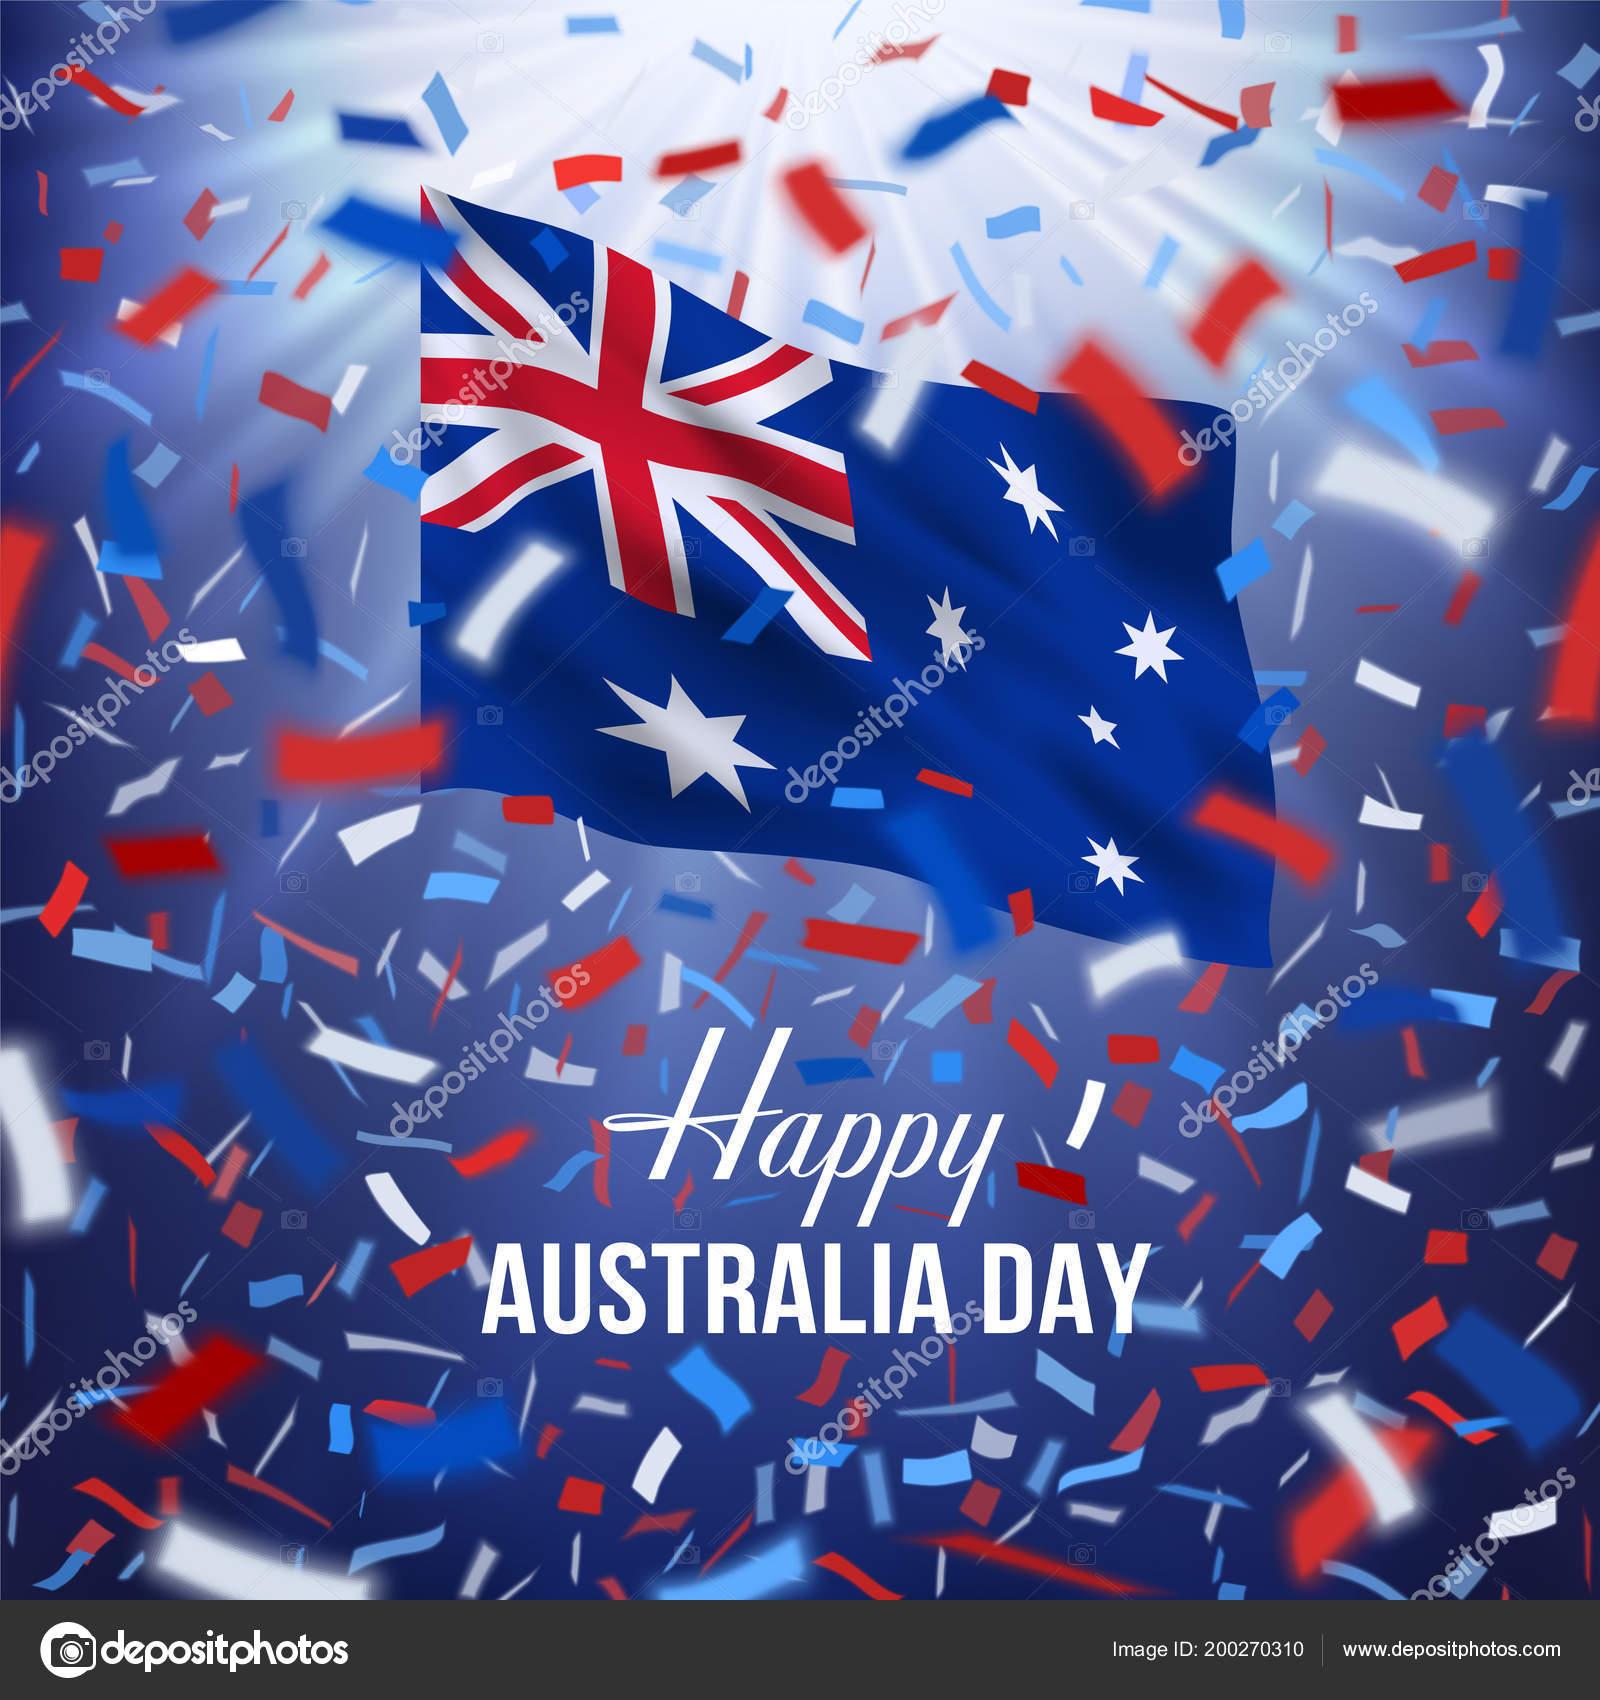 Happy Australia Day Greeting Card Stock Vector Mirrima 200270310